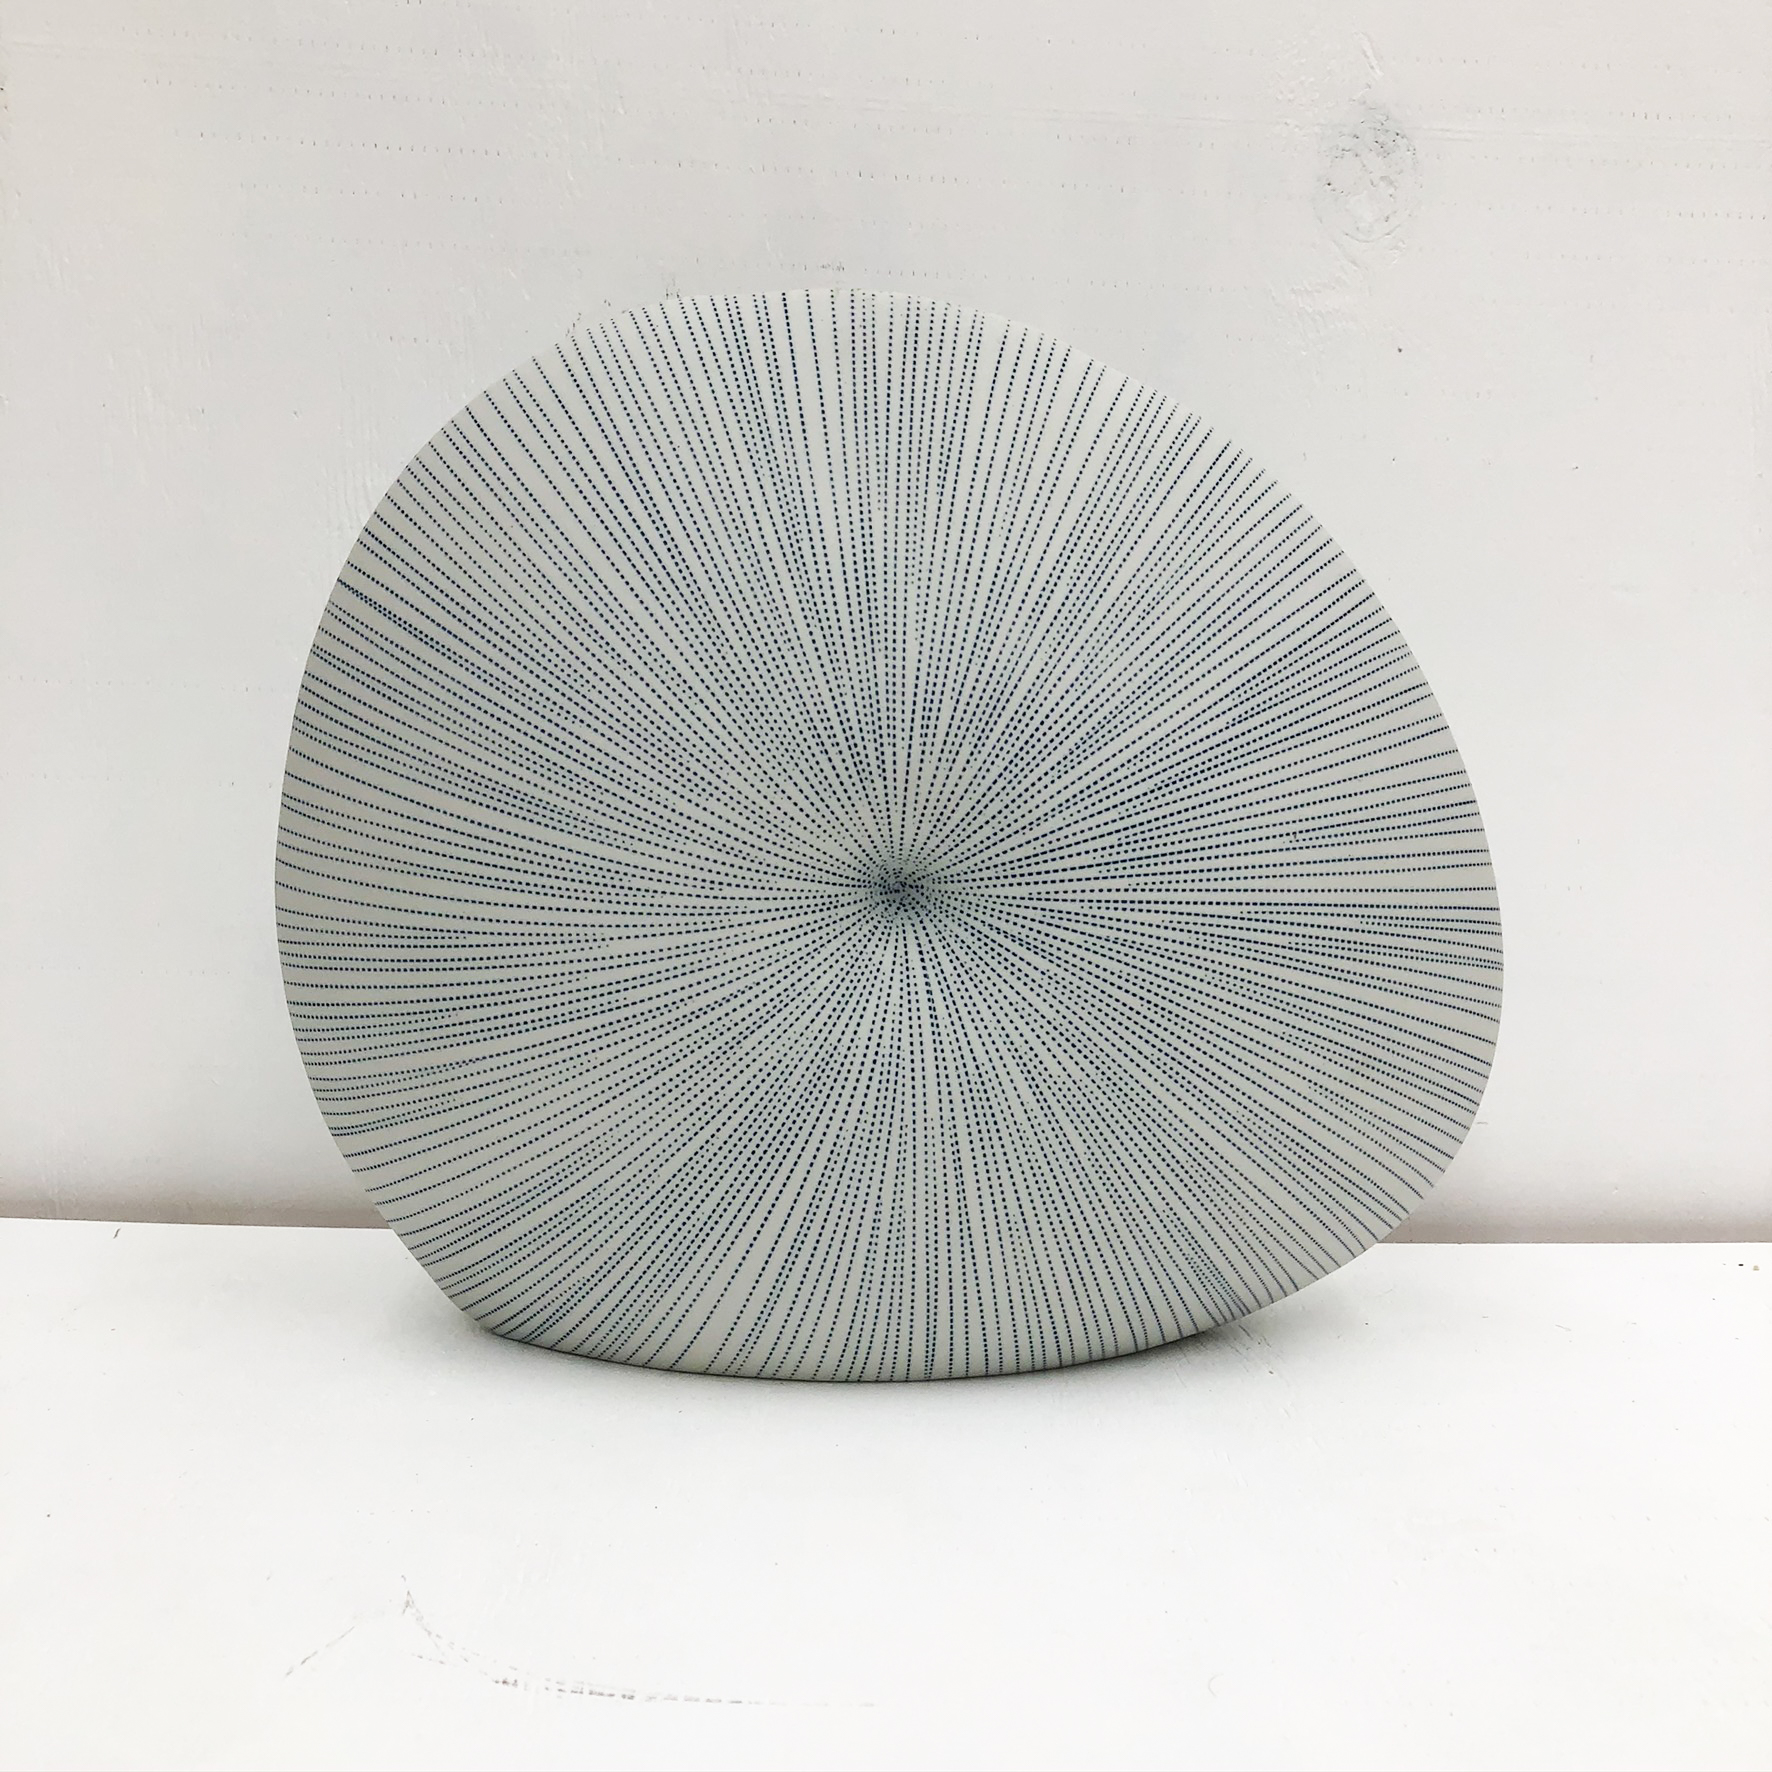 Diva Round S Handmade Vase - side view